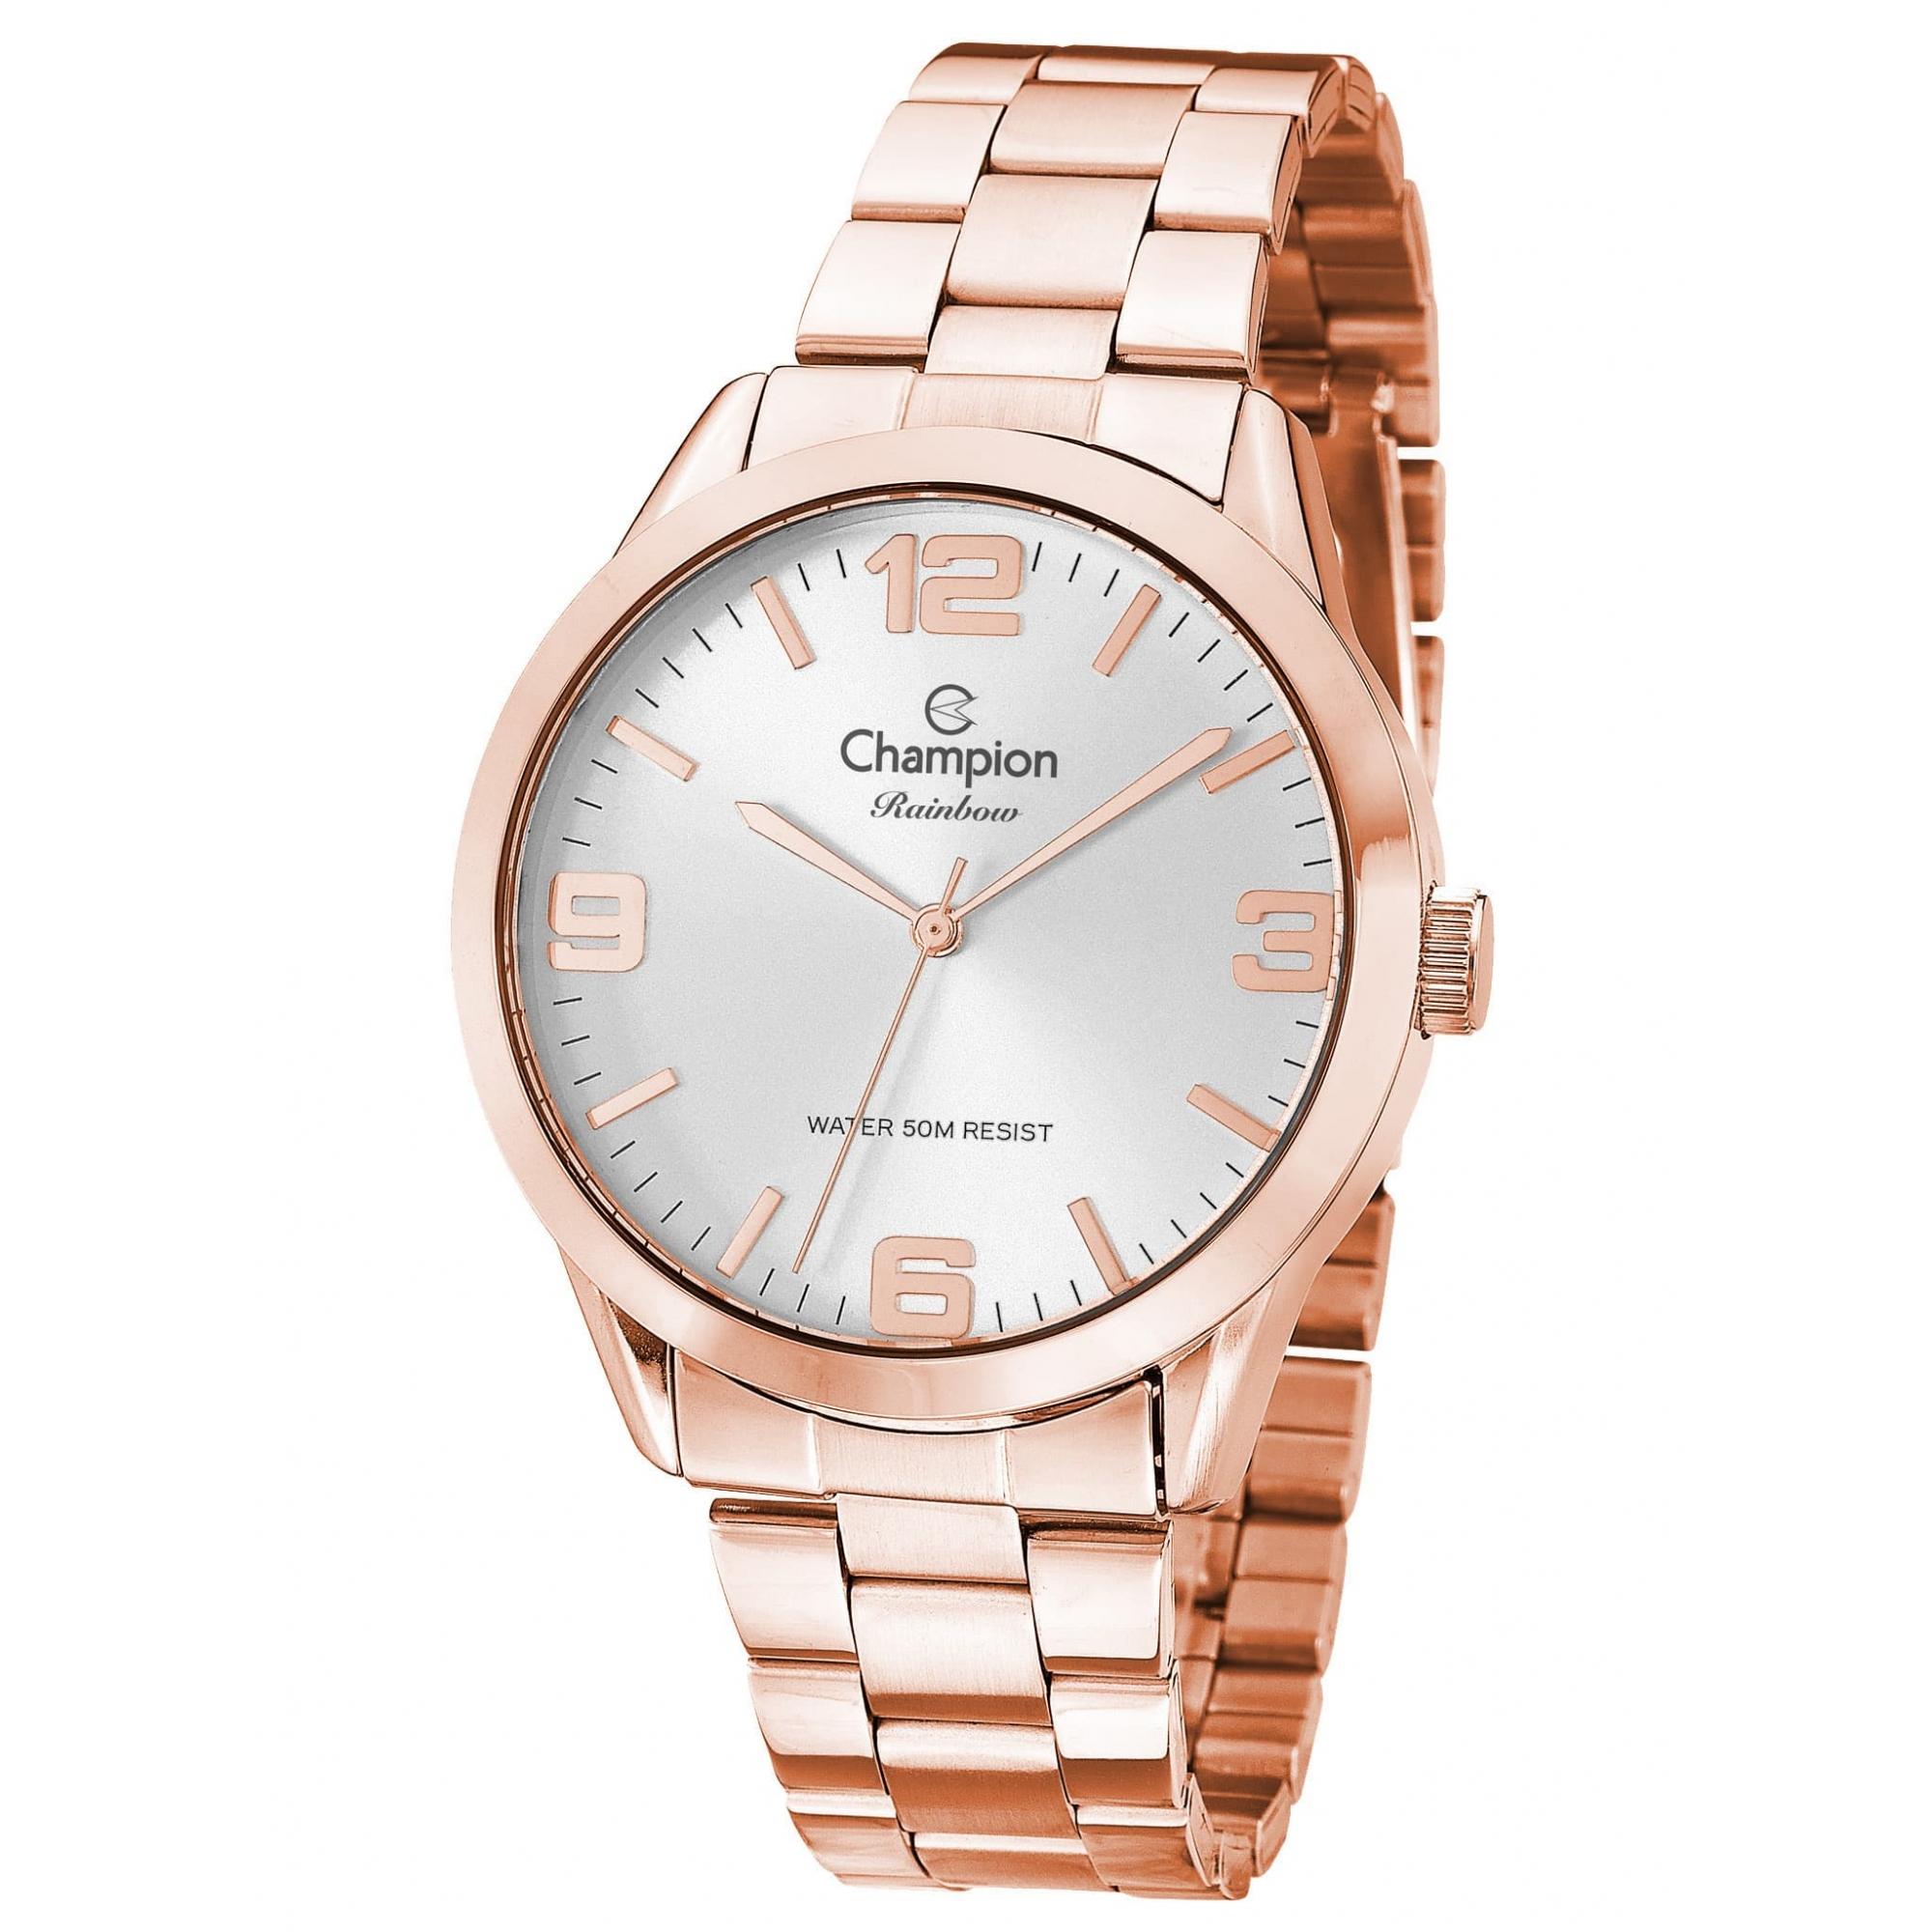 Relógio Champion Feminino Rosé - Rainbow - CN29893Z